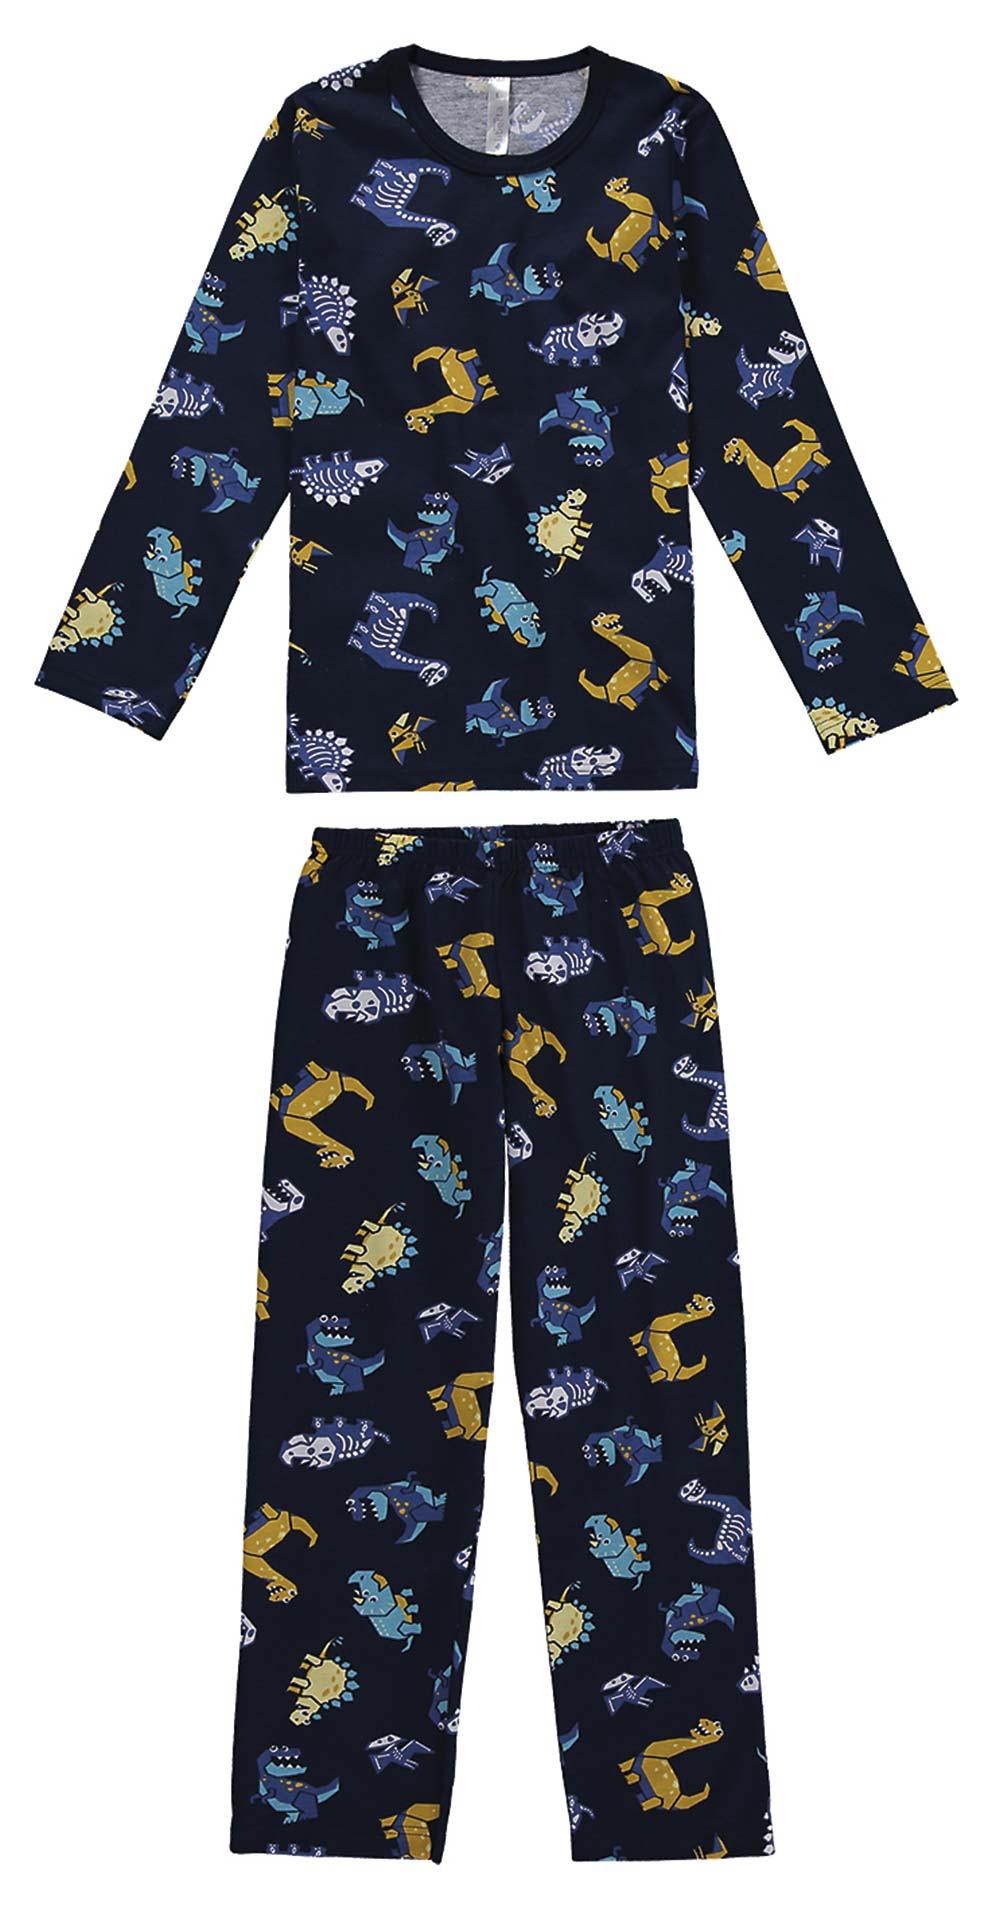 Pijama Infantil Masculino  Inverno Azul Dinos Malwee